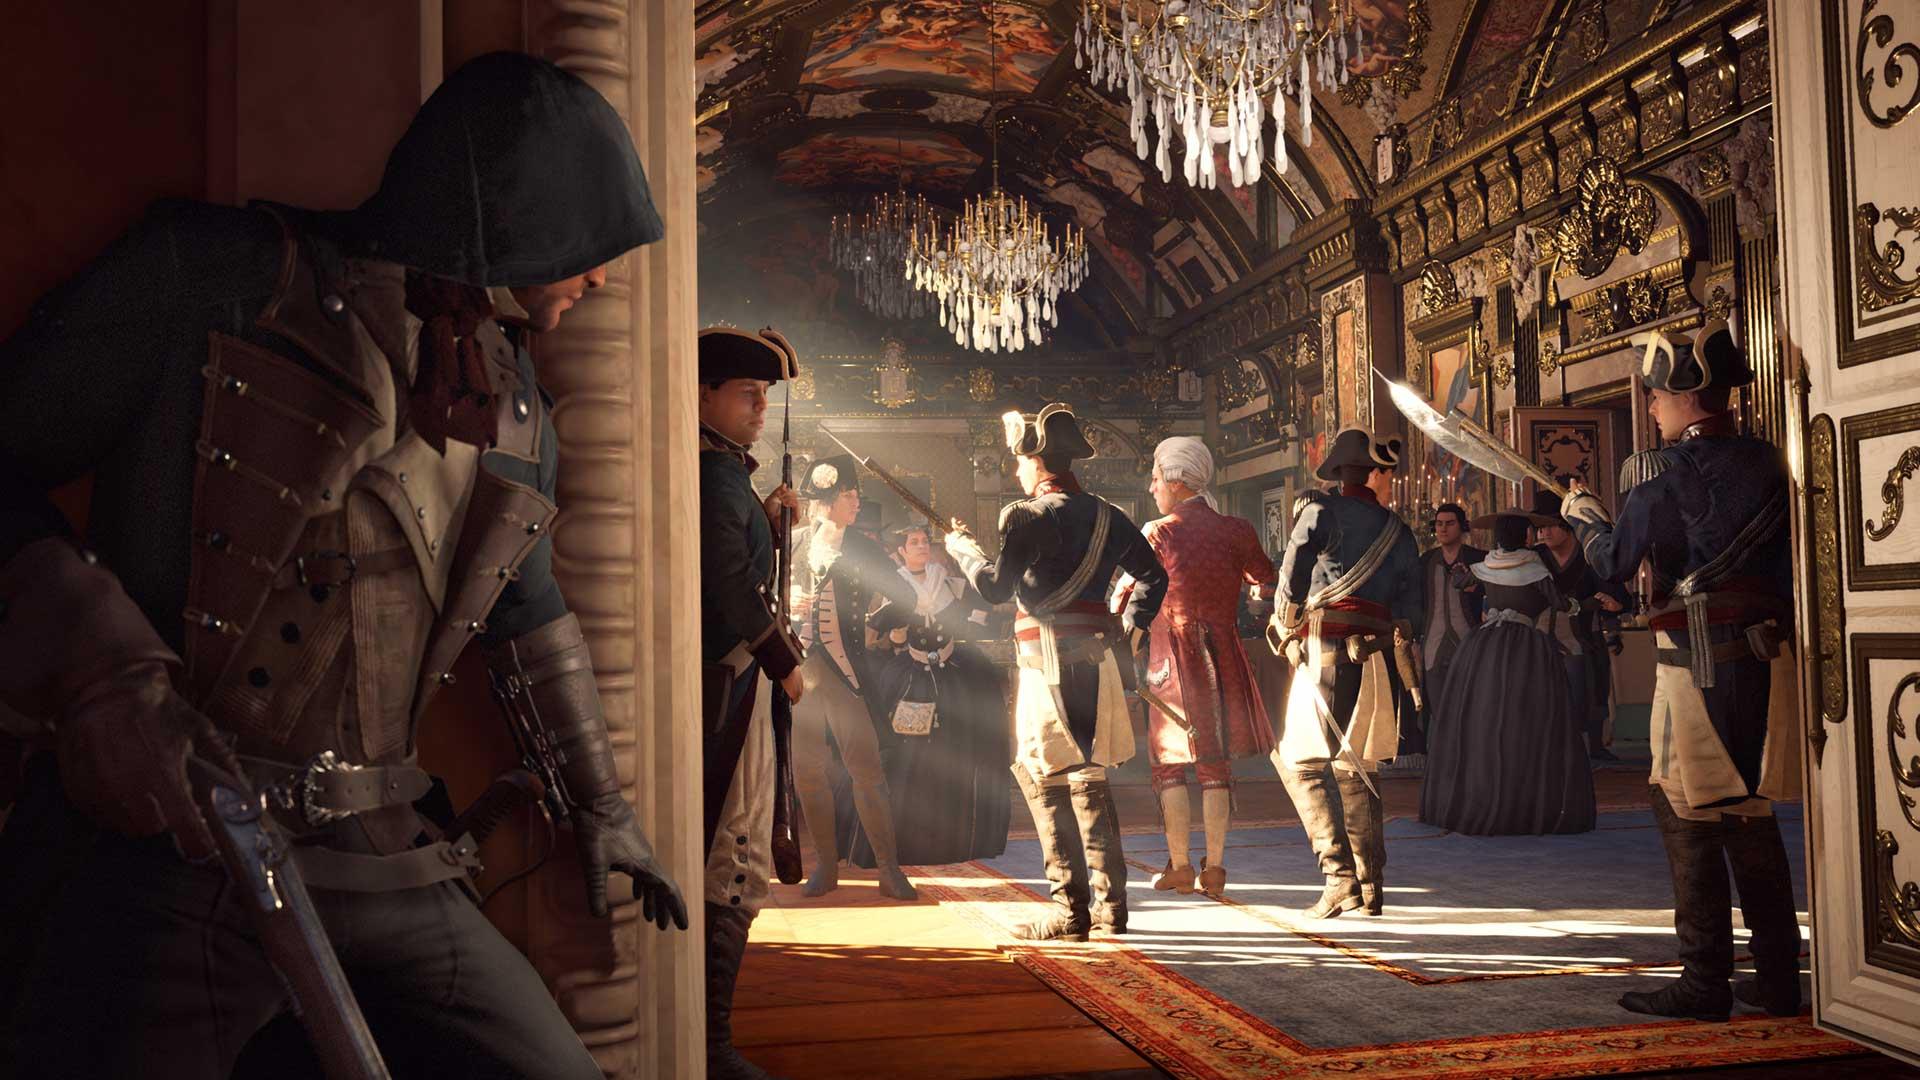 6. Assassin's Creed Unity